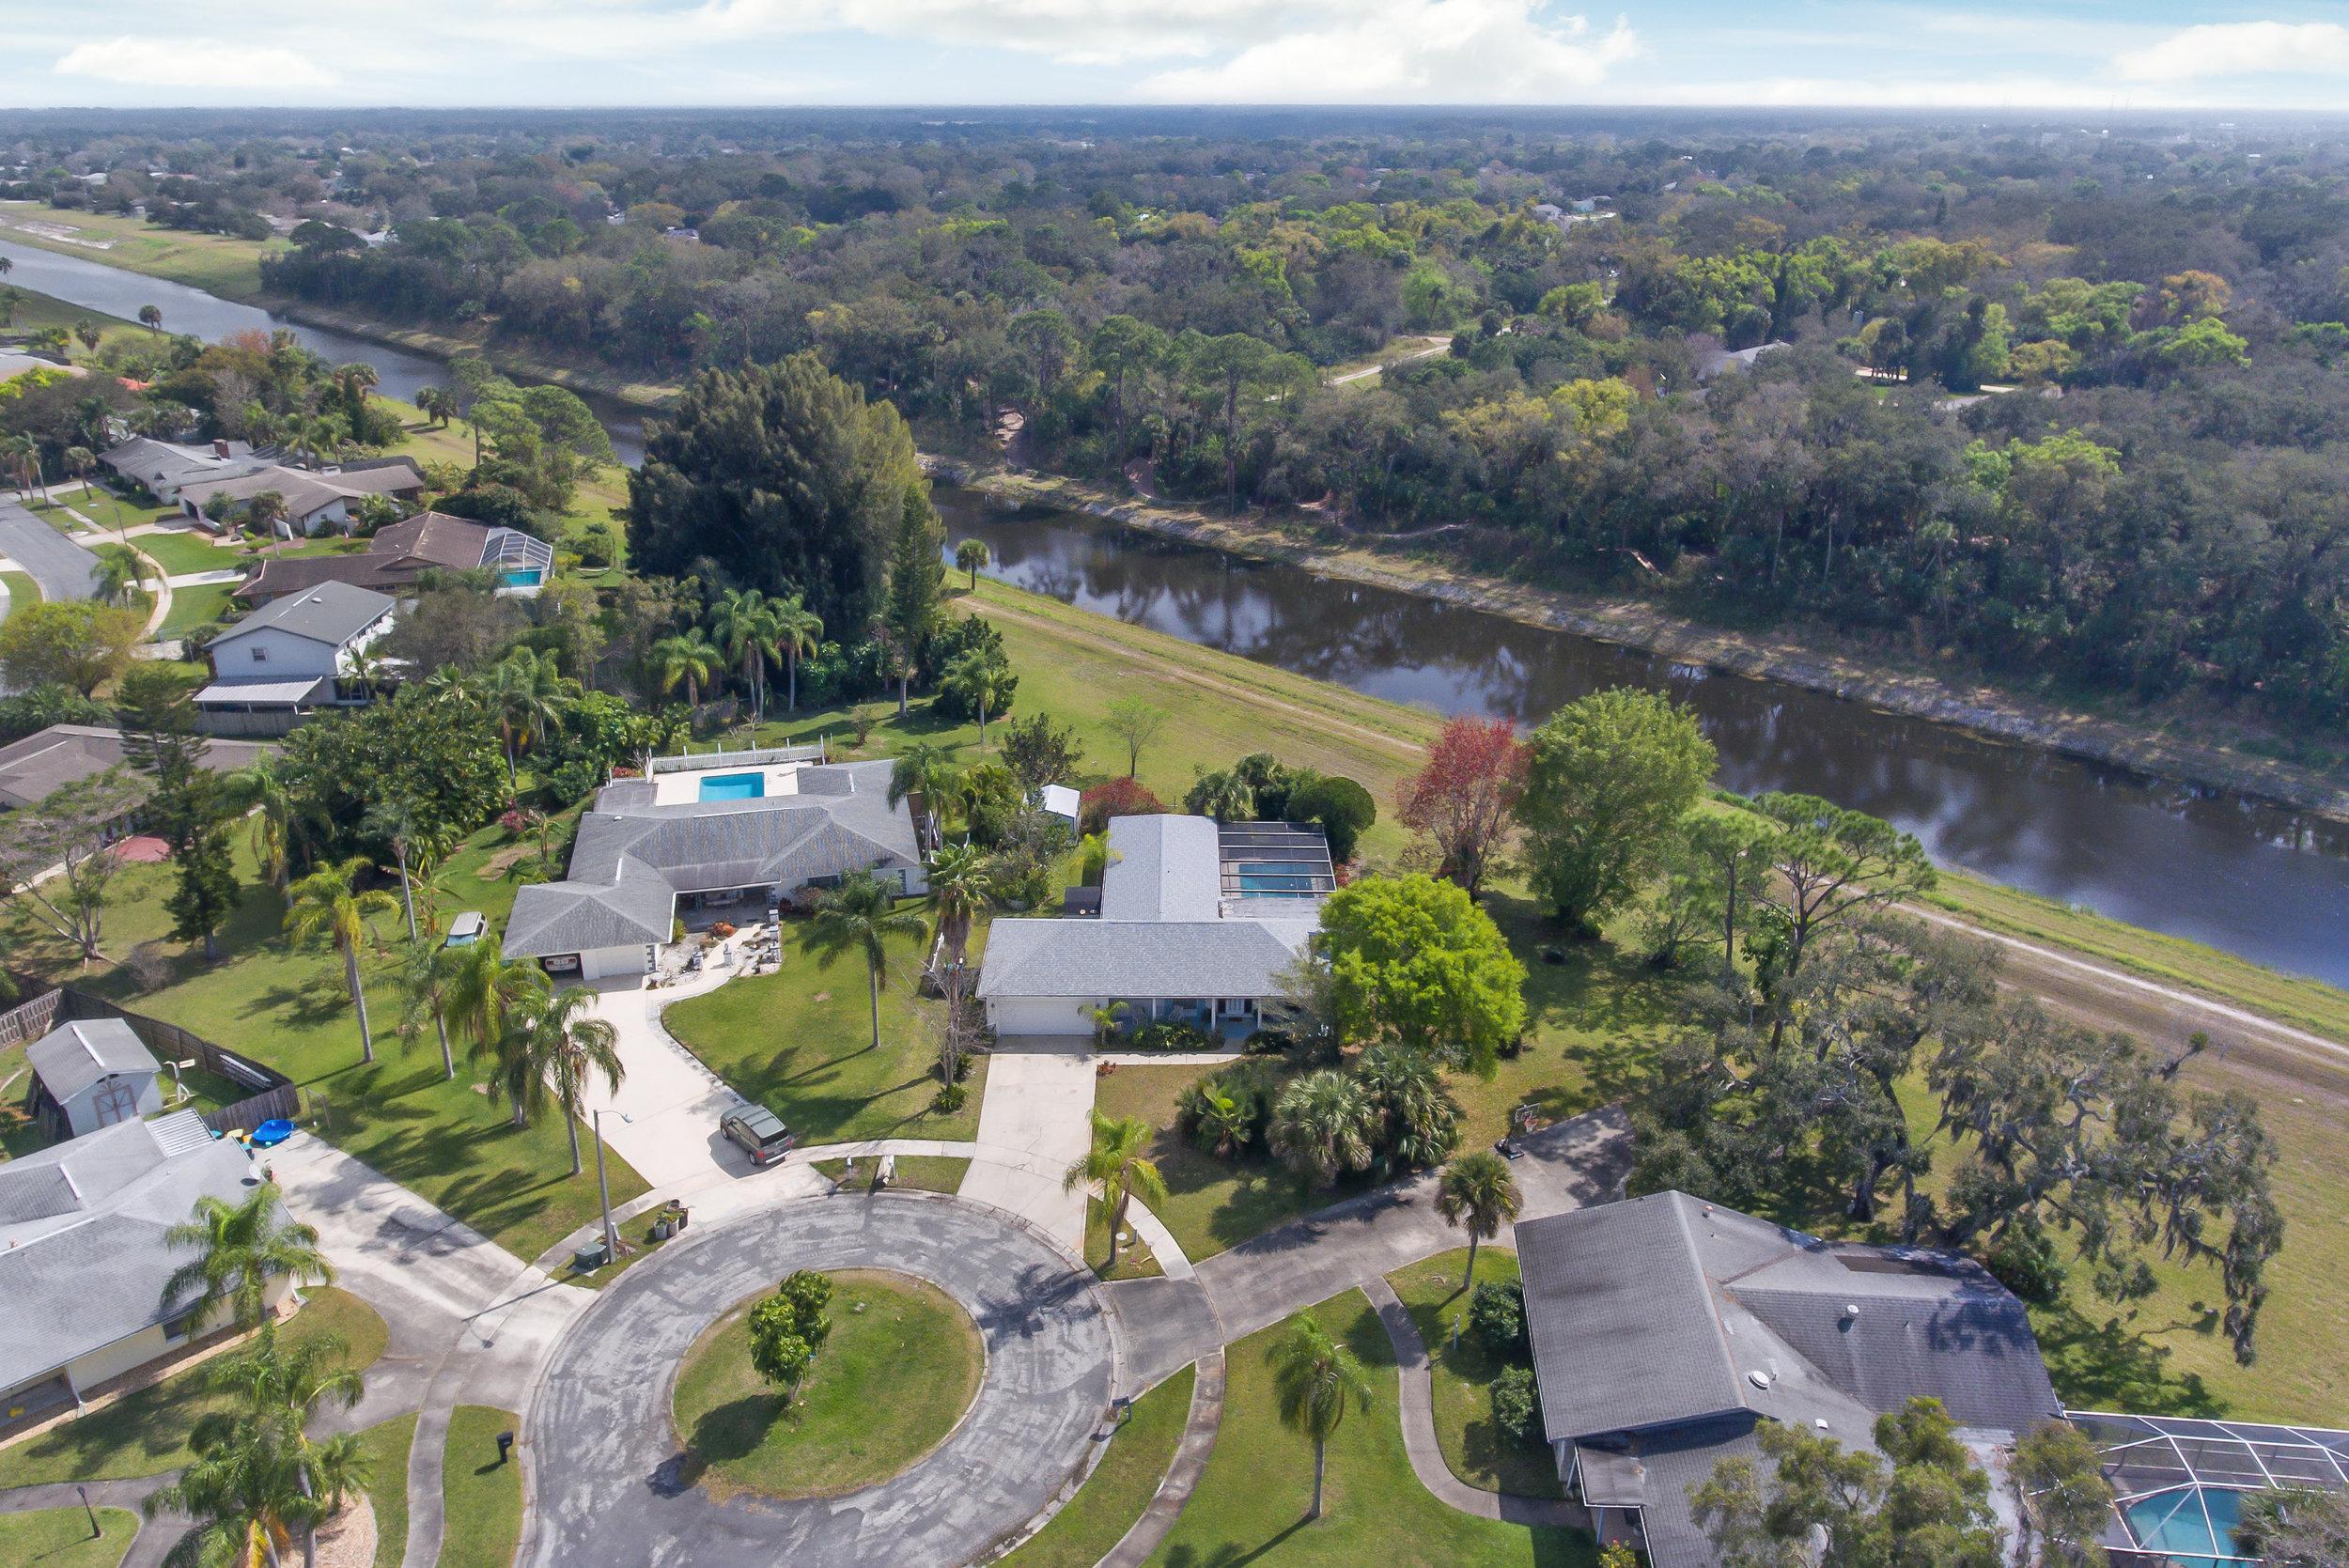 606 Dunbarton Circle NE Palm Bay, FL 32905. For Sale by Brent Burns